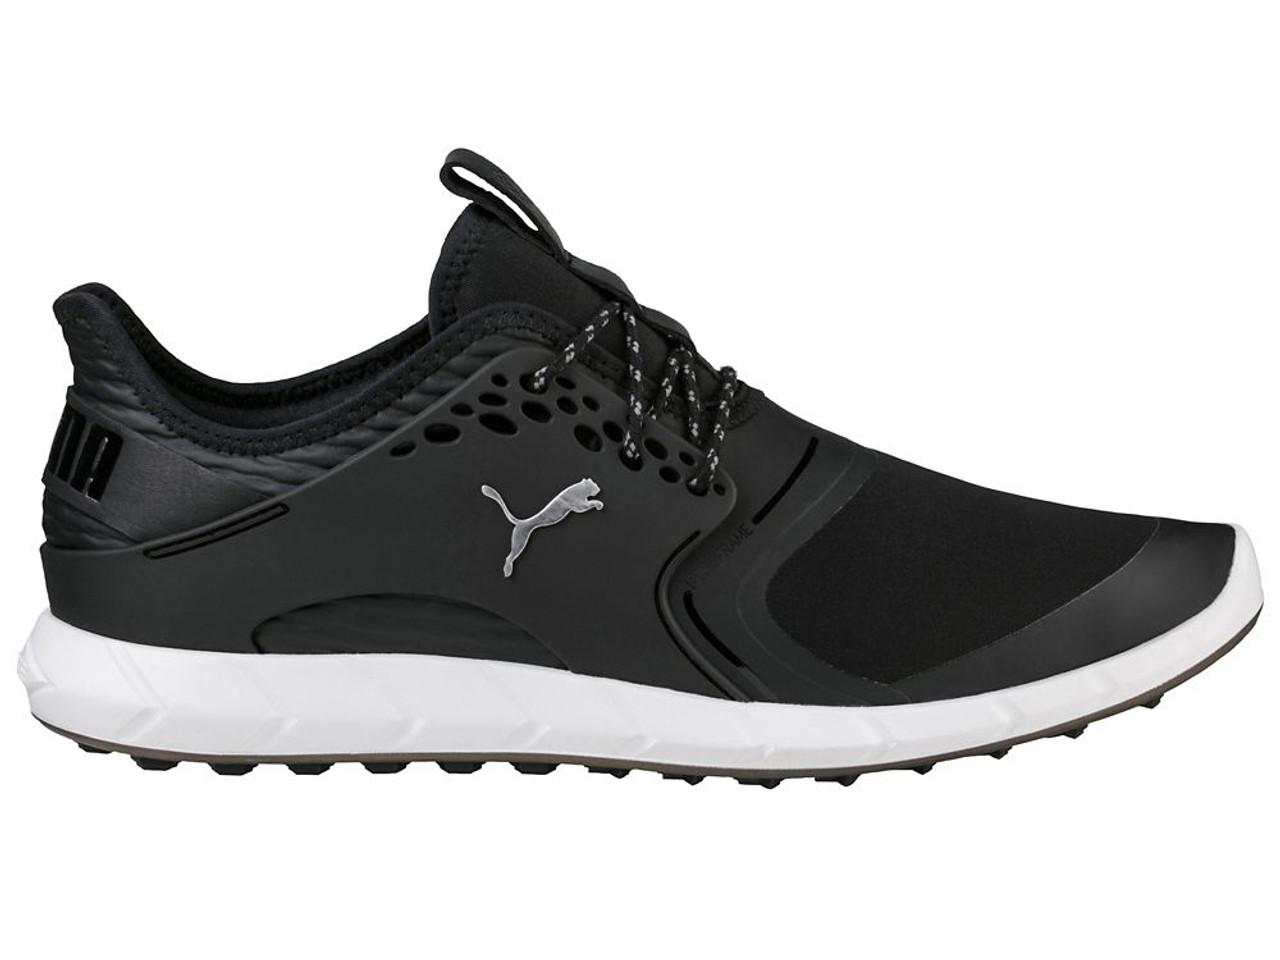 Puma Ignite PWRsport Shoes BlackSilver